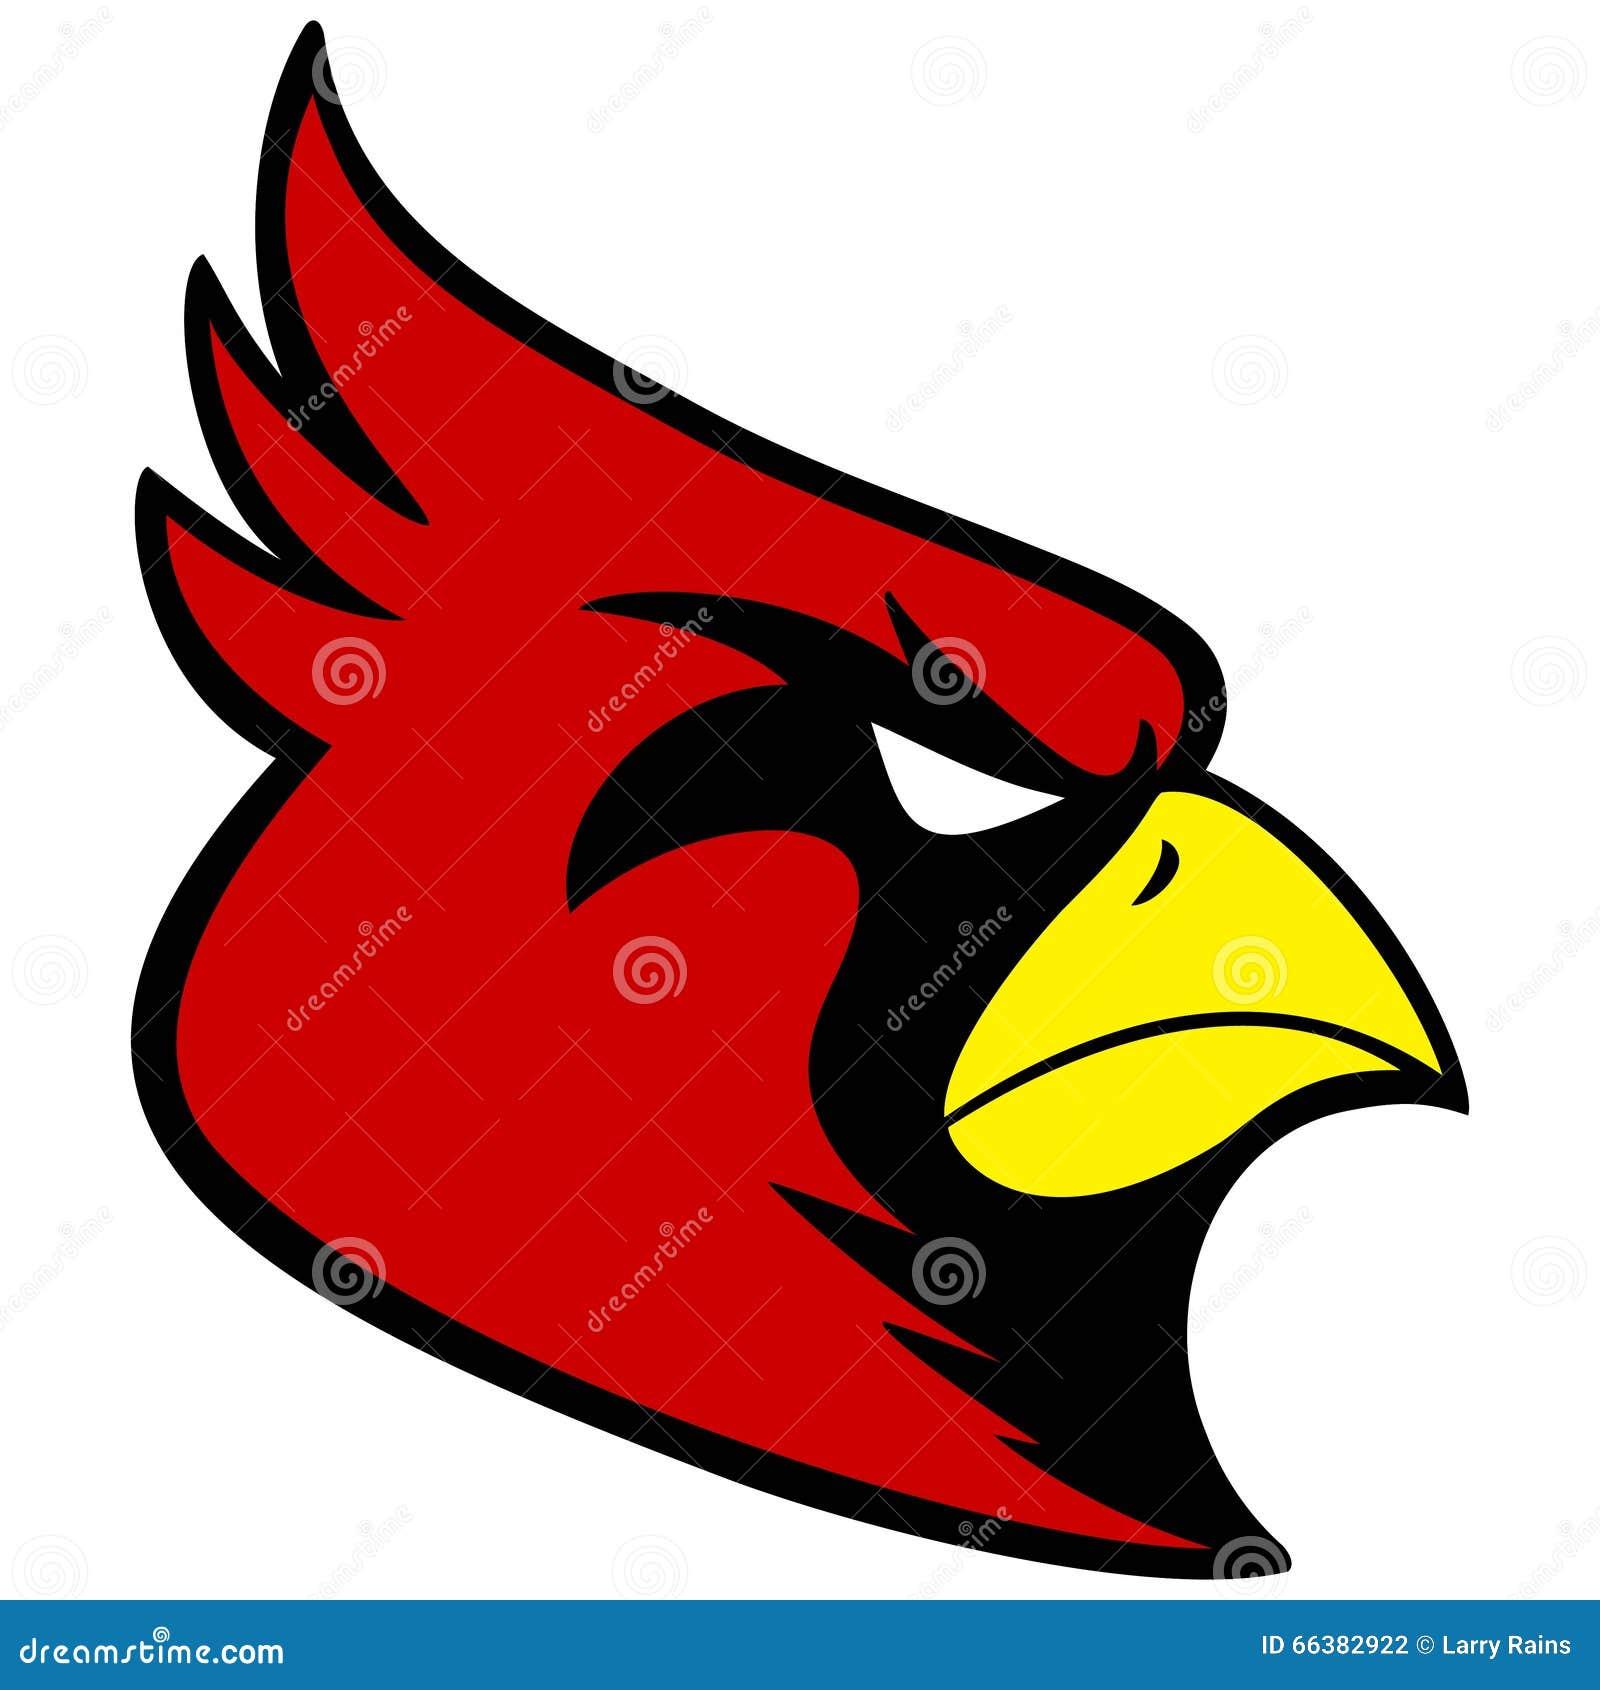 Cardinal Sports Mascot Stock Vector - Image: 66382922